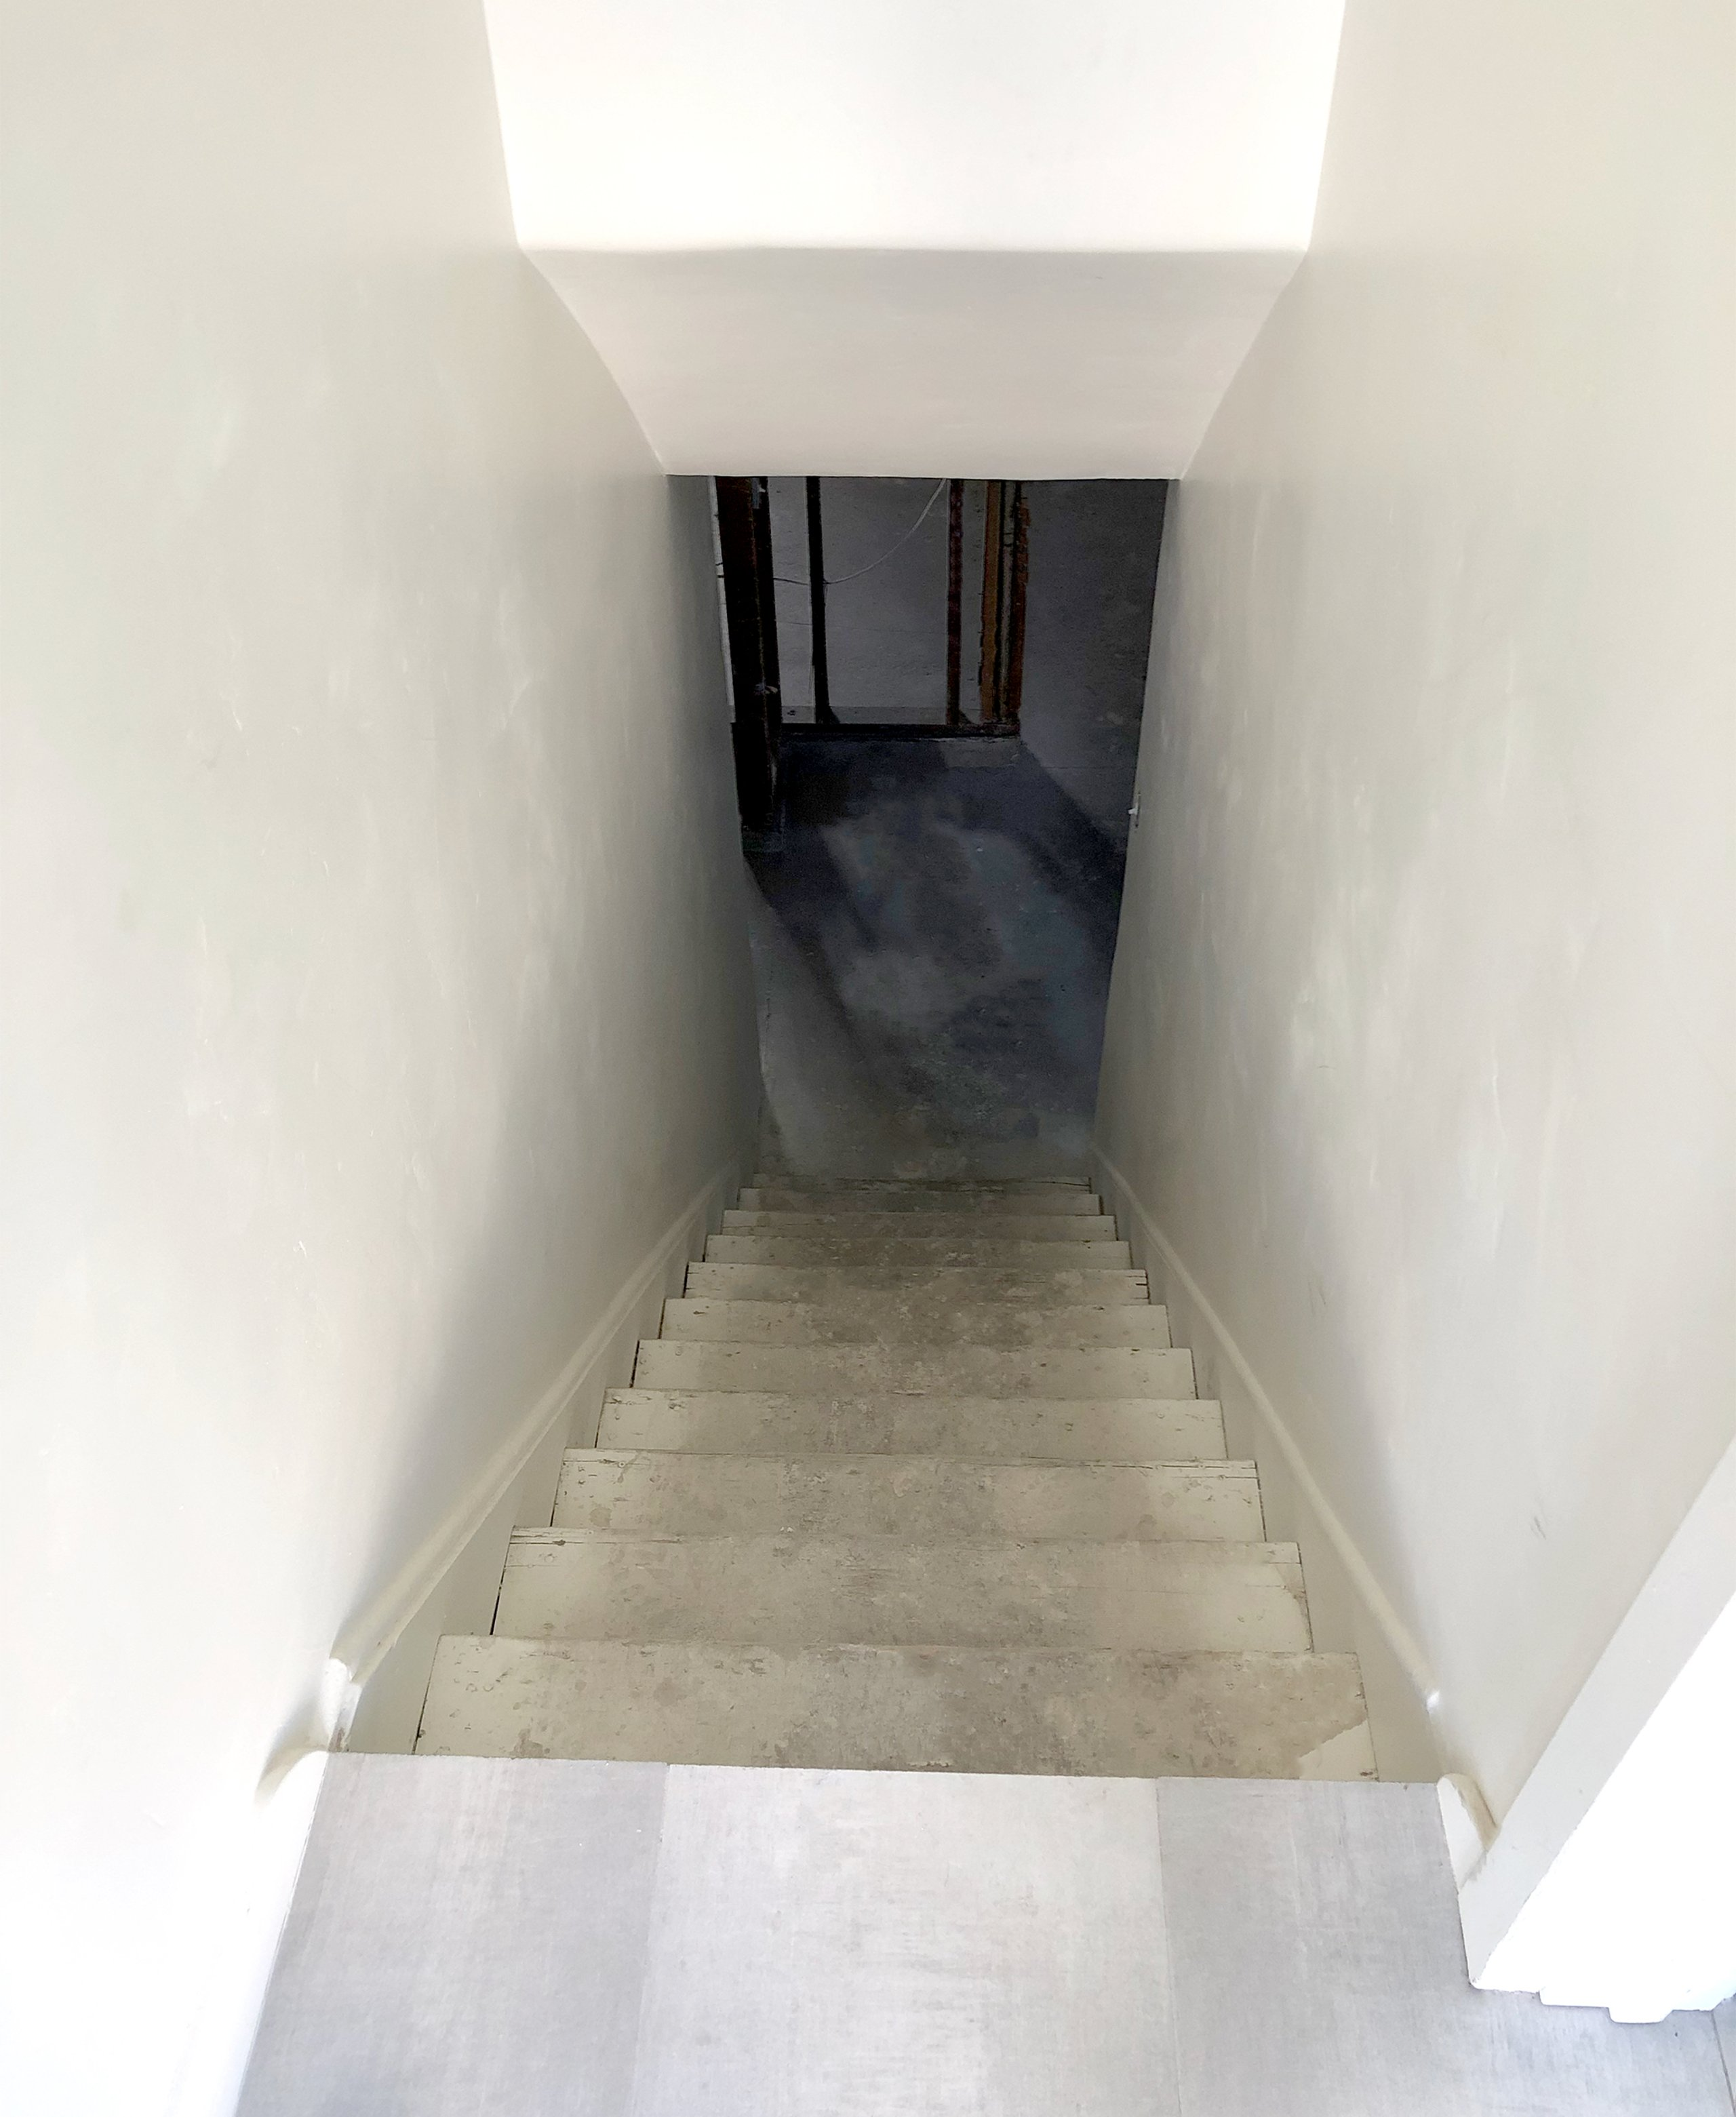 13x9 Basement self storage unit